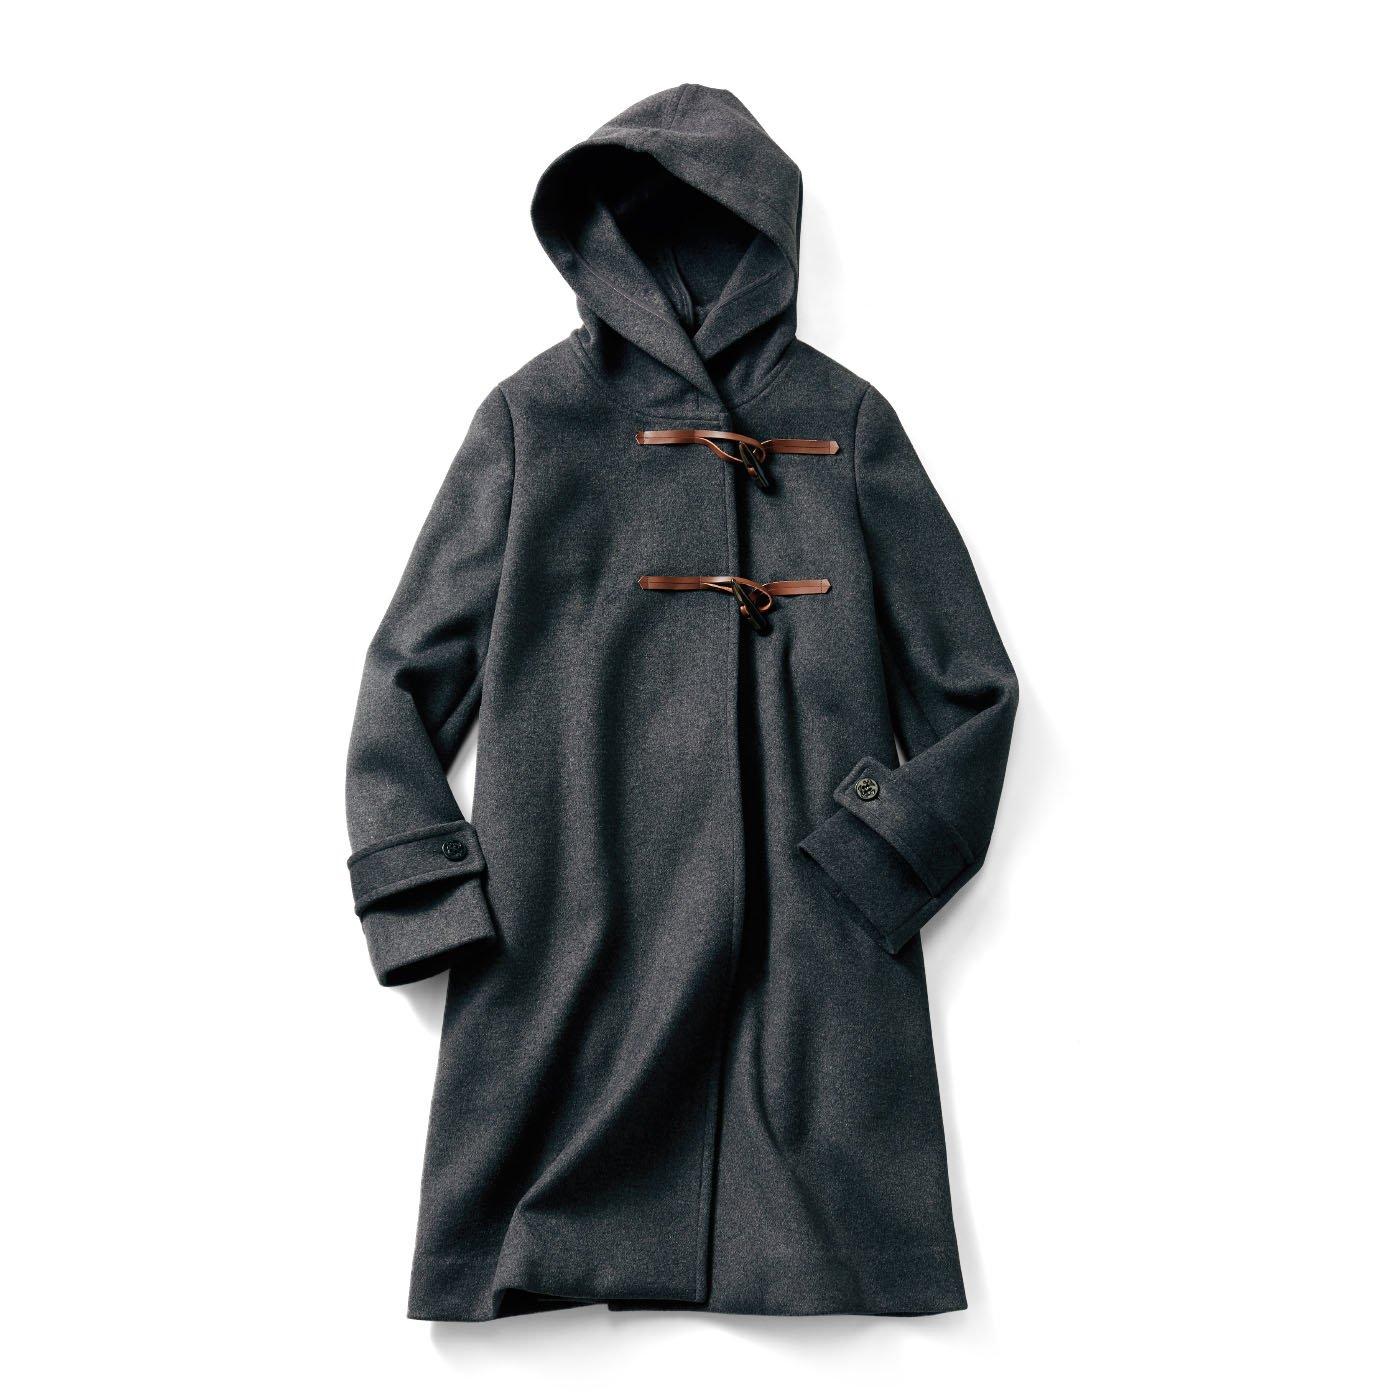 IEDIT ふわりと広がって細見え シックなフーデッドコート〈チャコールグレー〉